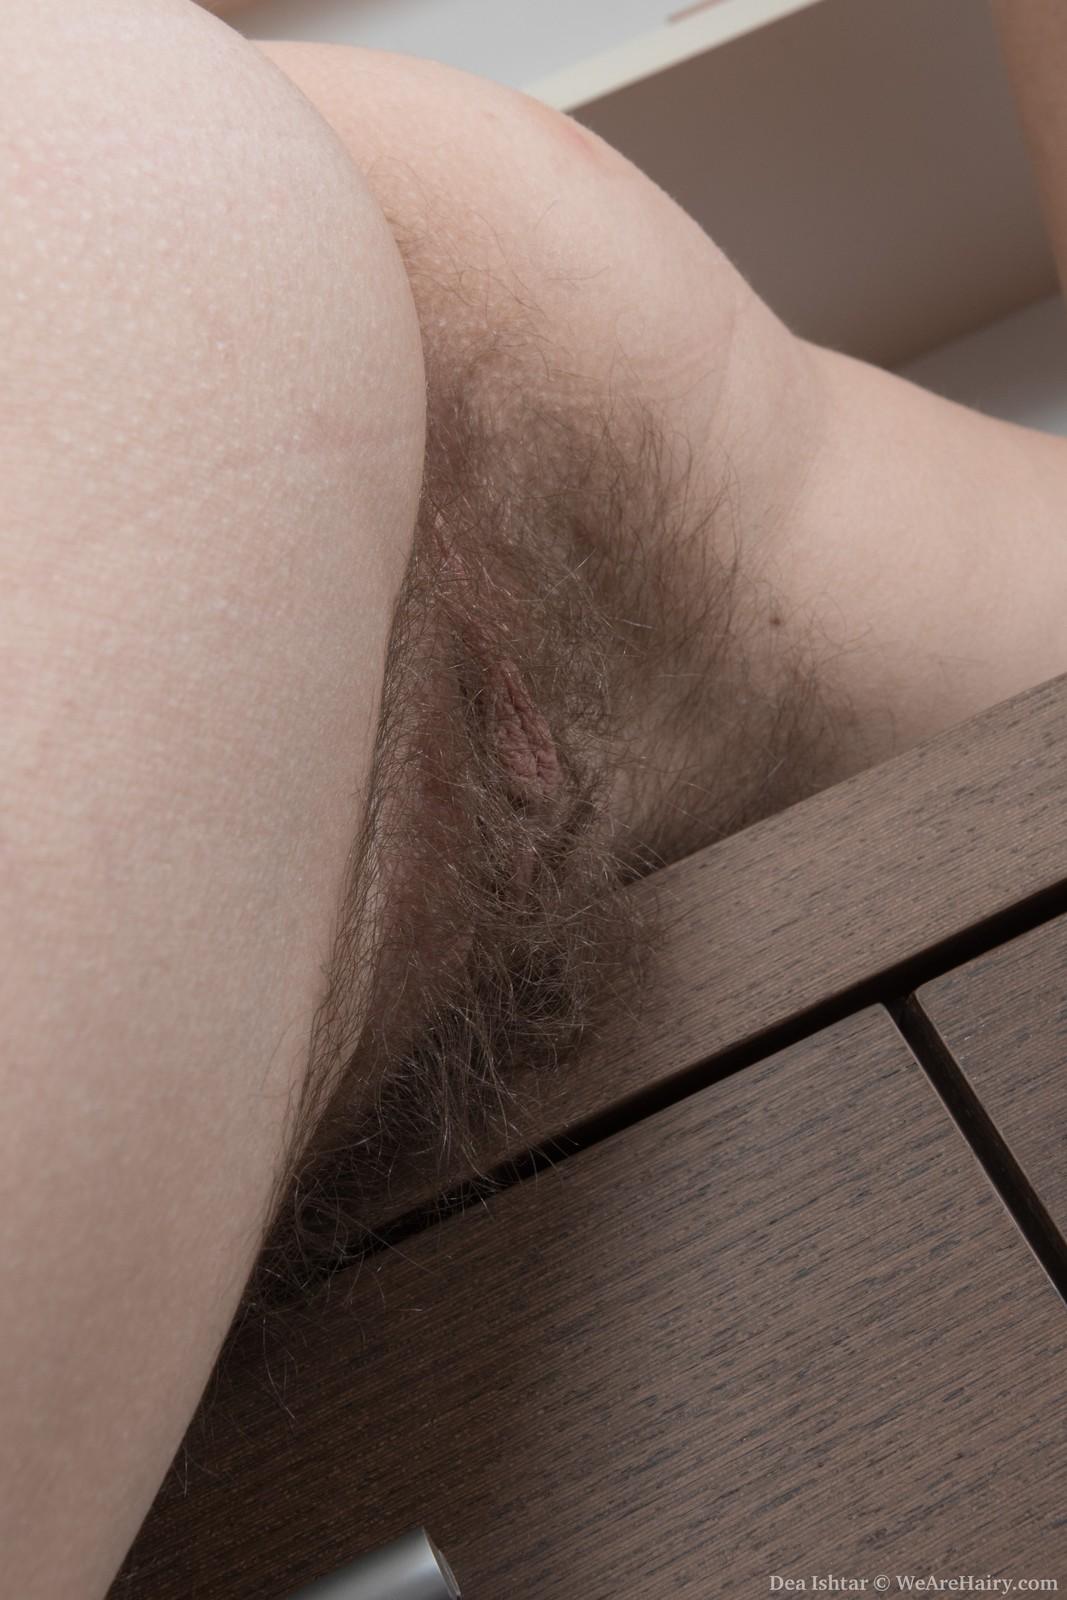 wpid-dea-ishtar-strips-and-shows-off-hairy-body12.jpg